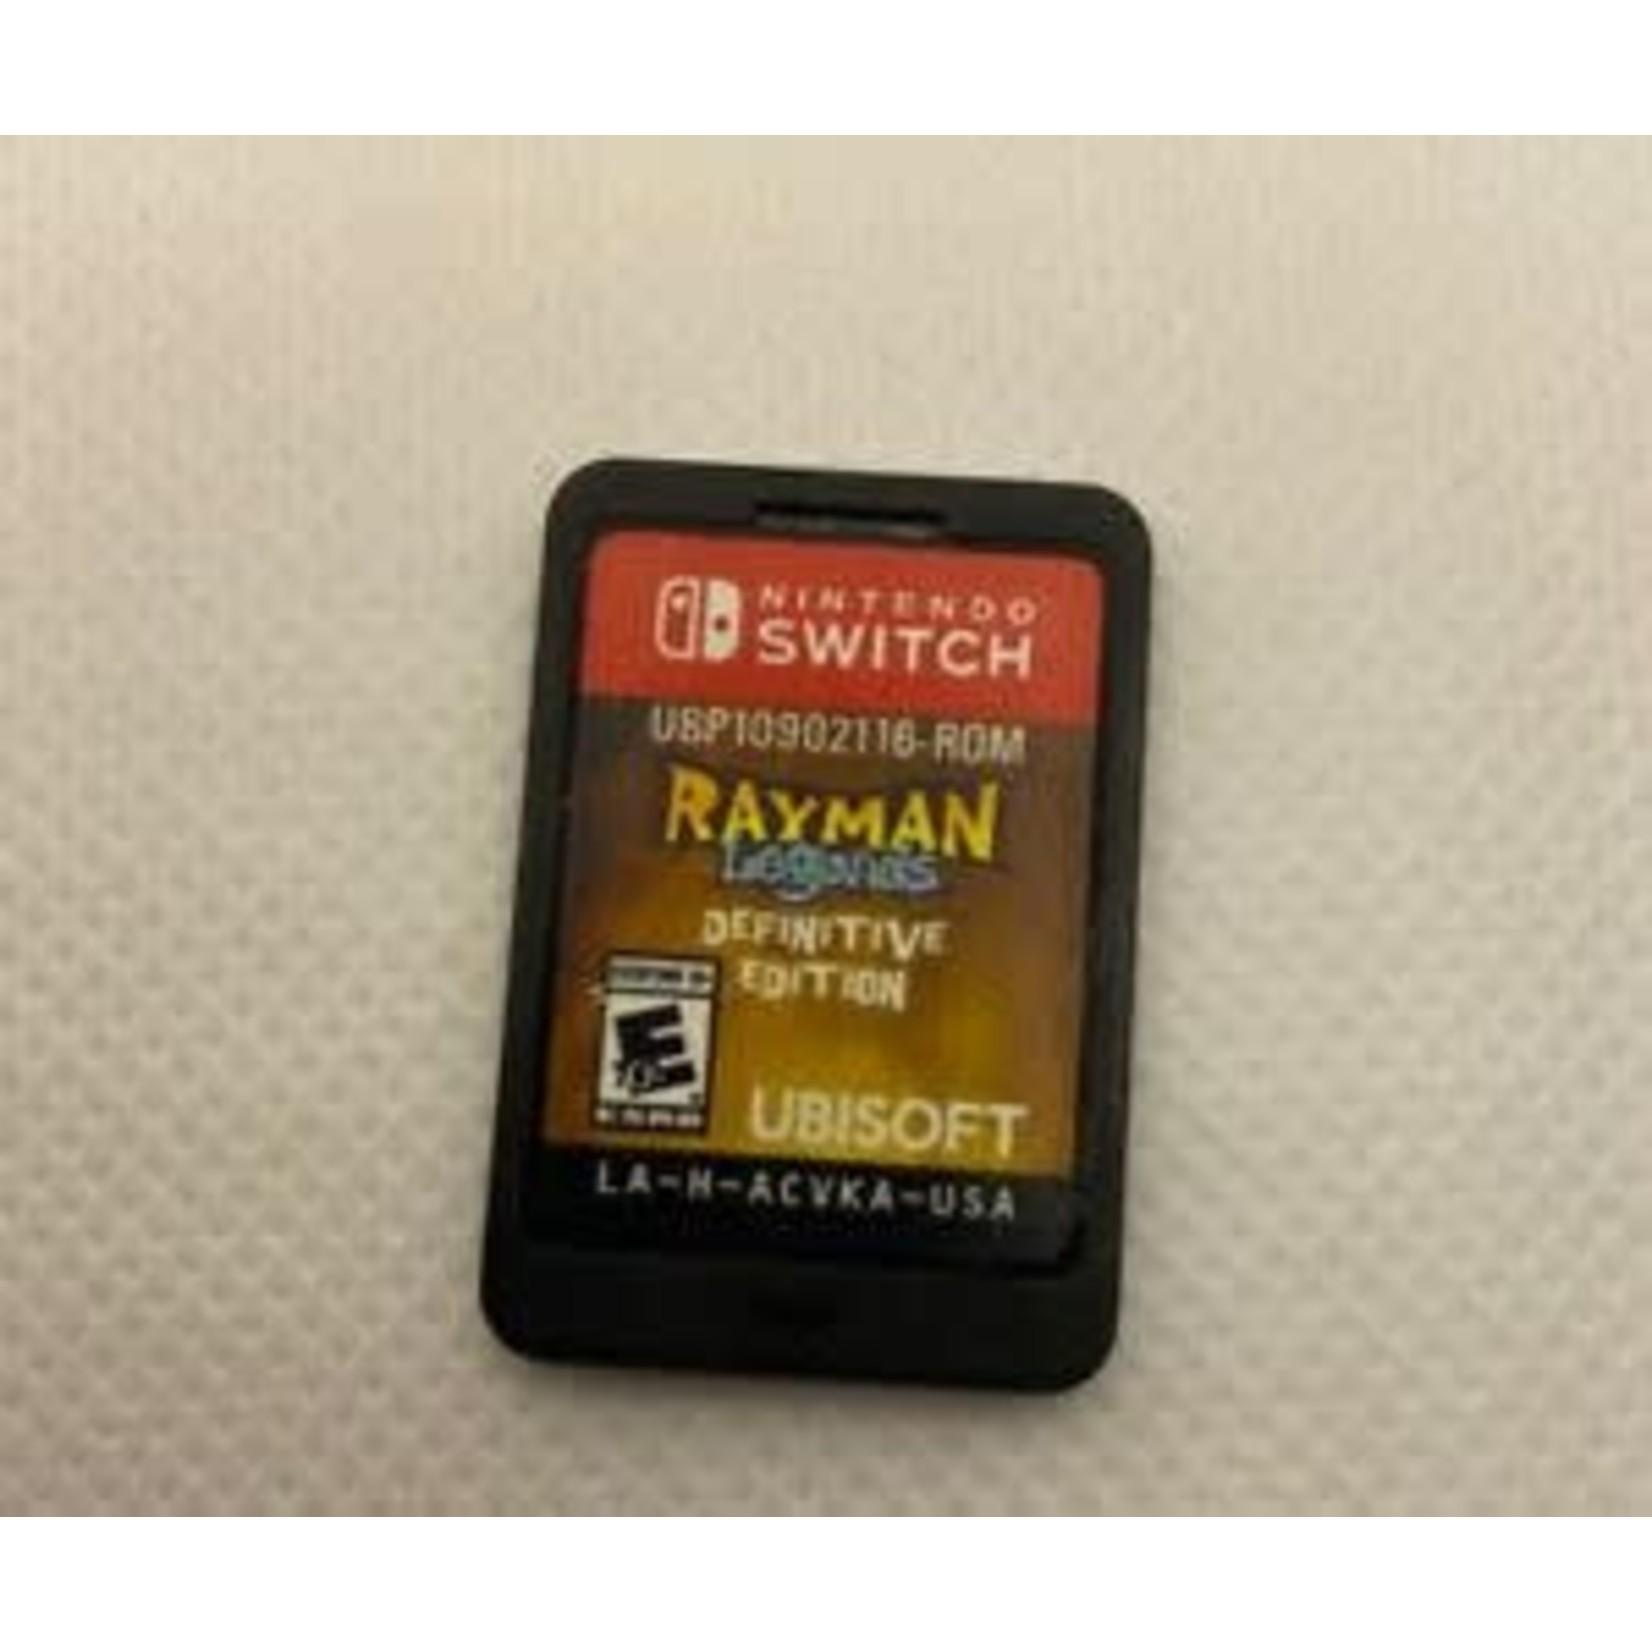 switchu-Rayman Legends (chip)